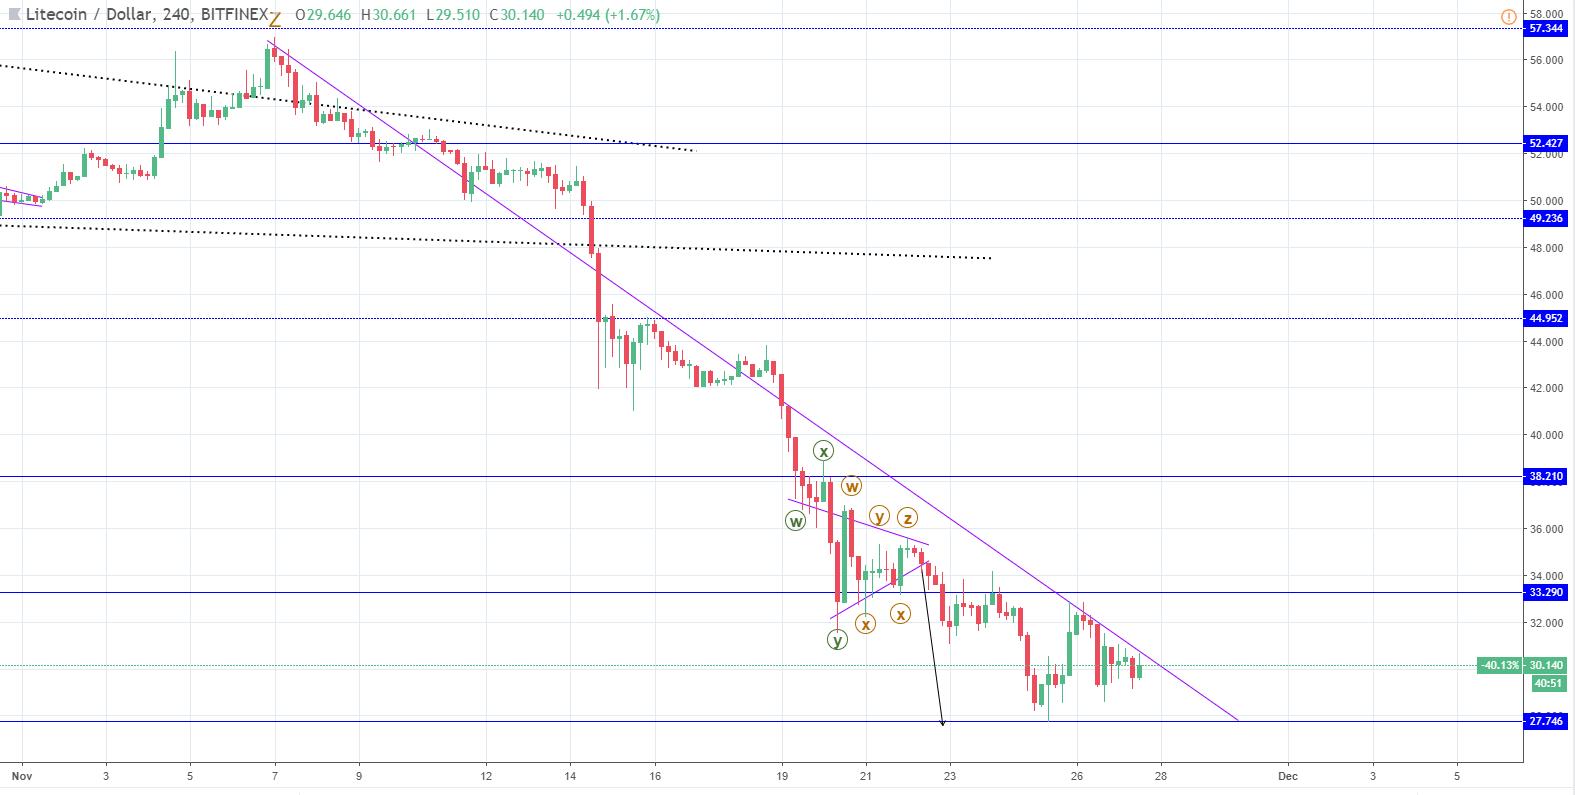 LTC/USD chart2 - FXOpen